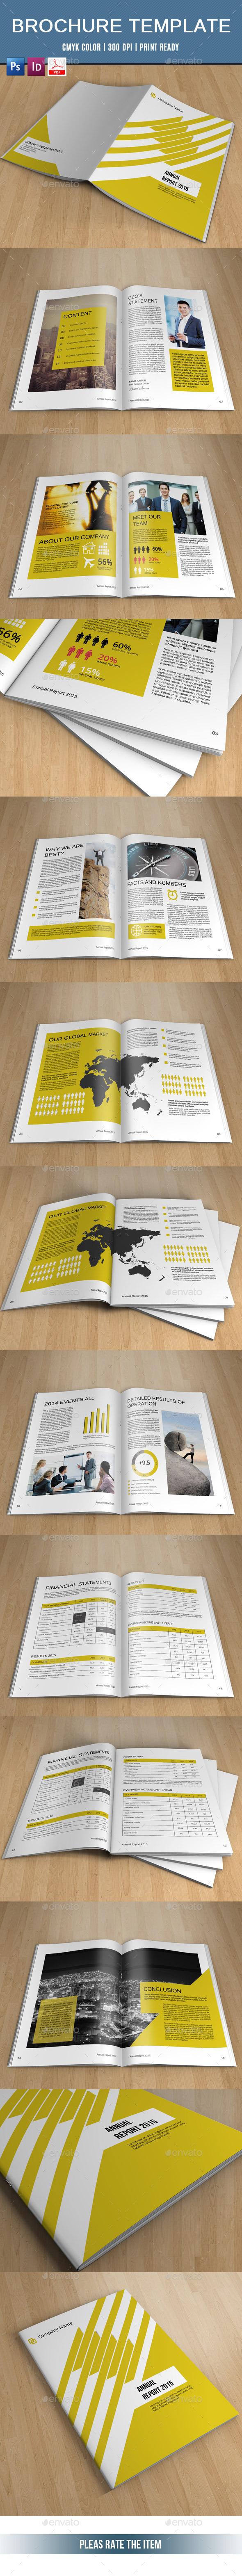 Annual Report Brochure-V220